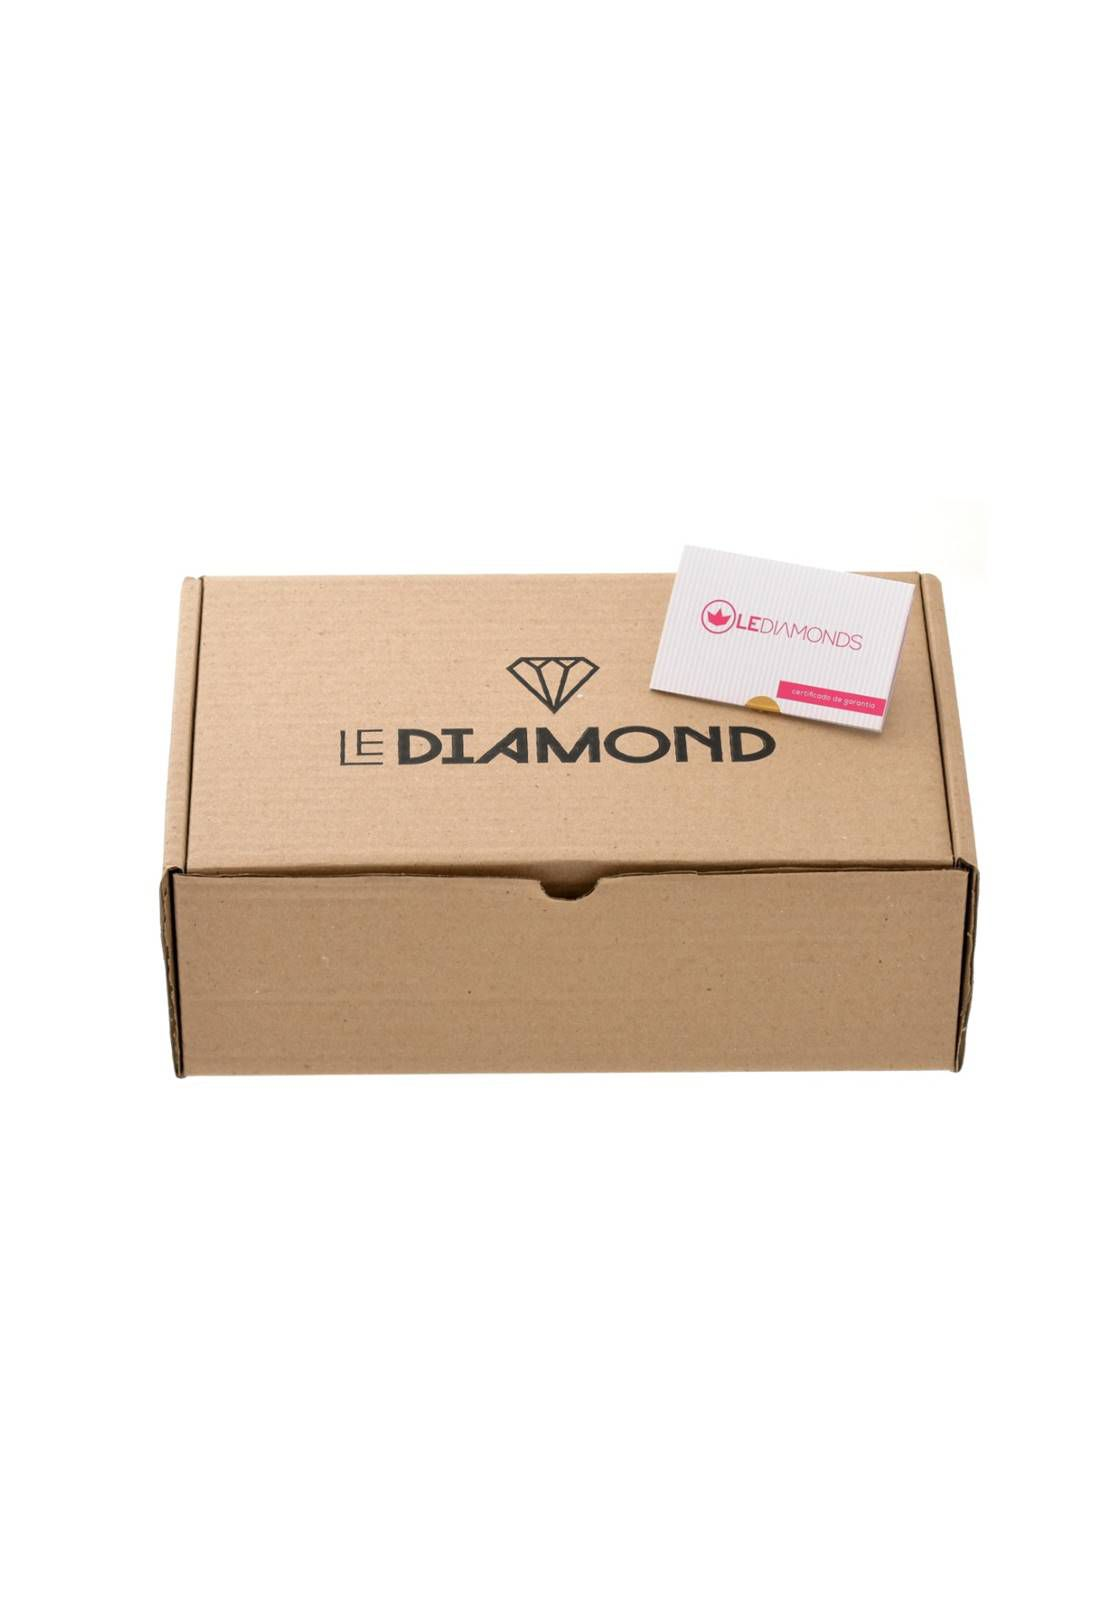 Brinco Le Diamond Madrepérola Flor de Resina Laranja